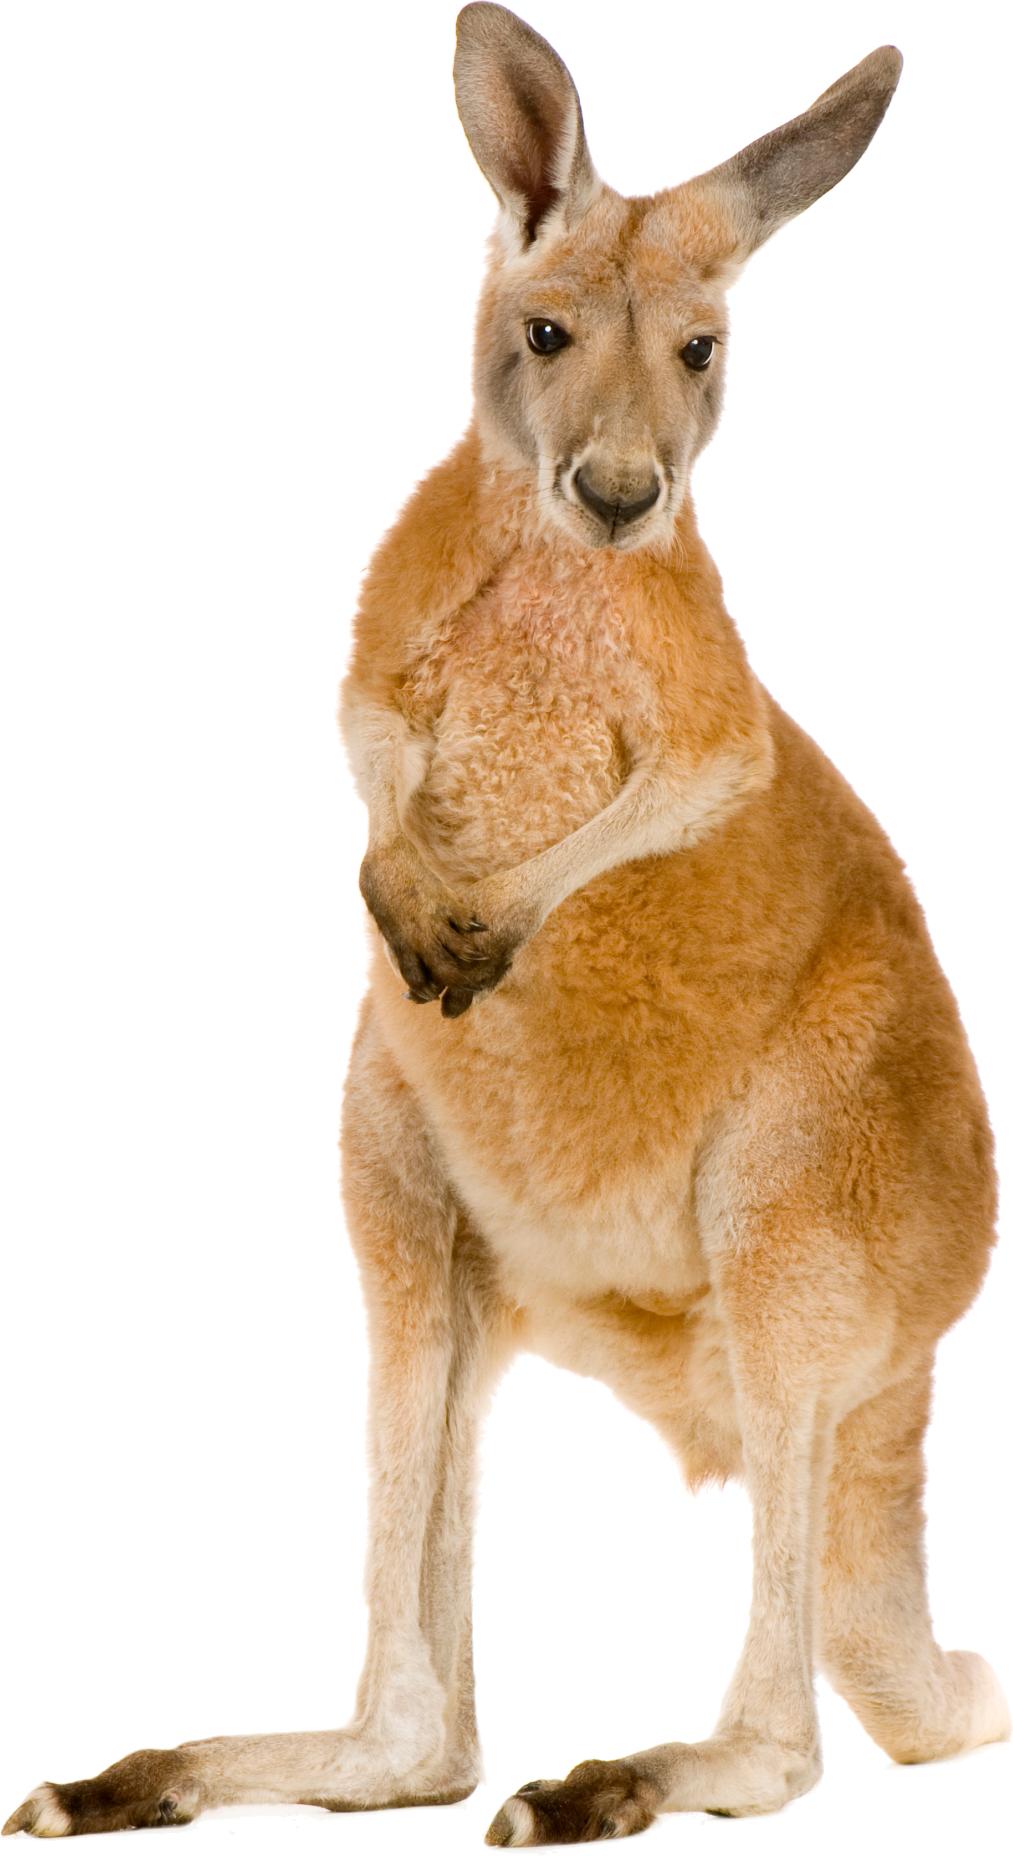 Kangaroo clipart orange. Icon web icons png